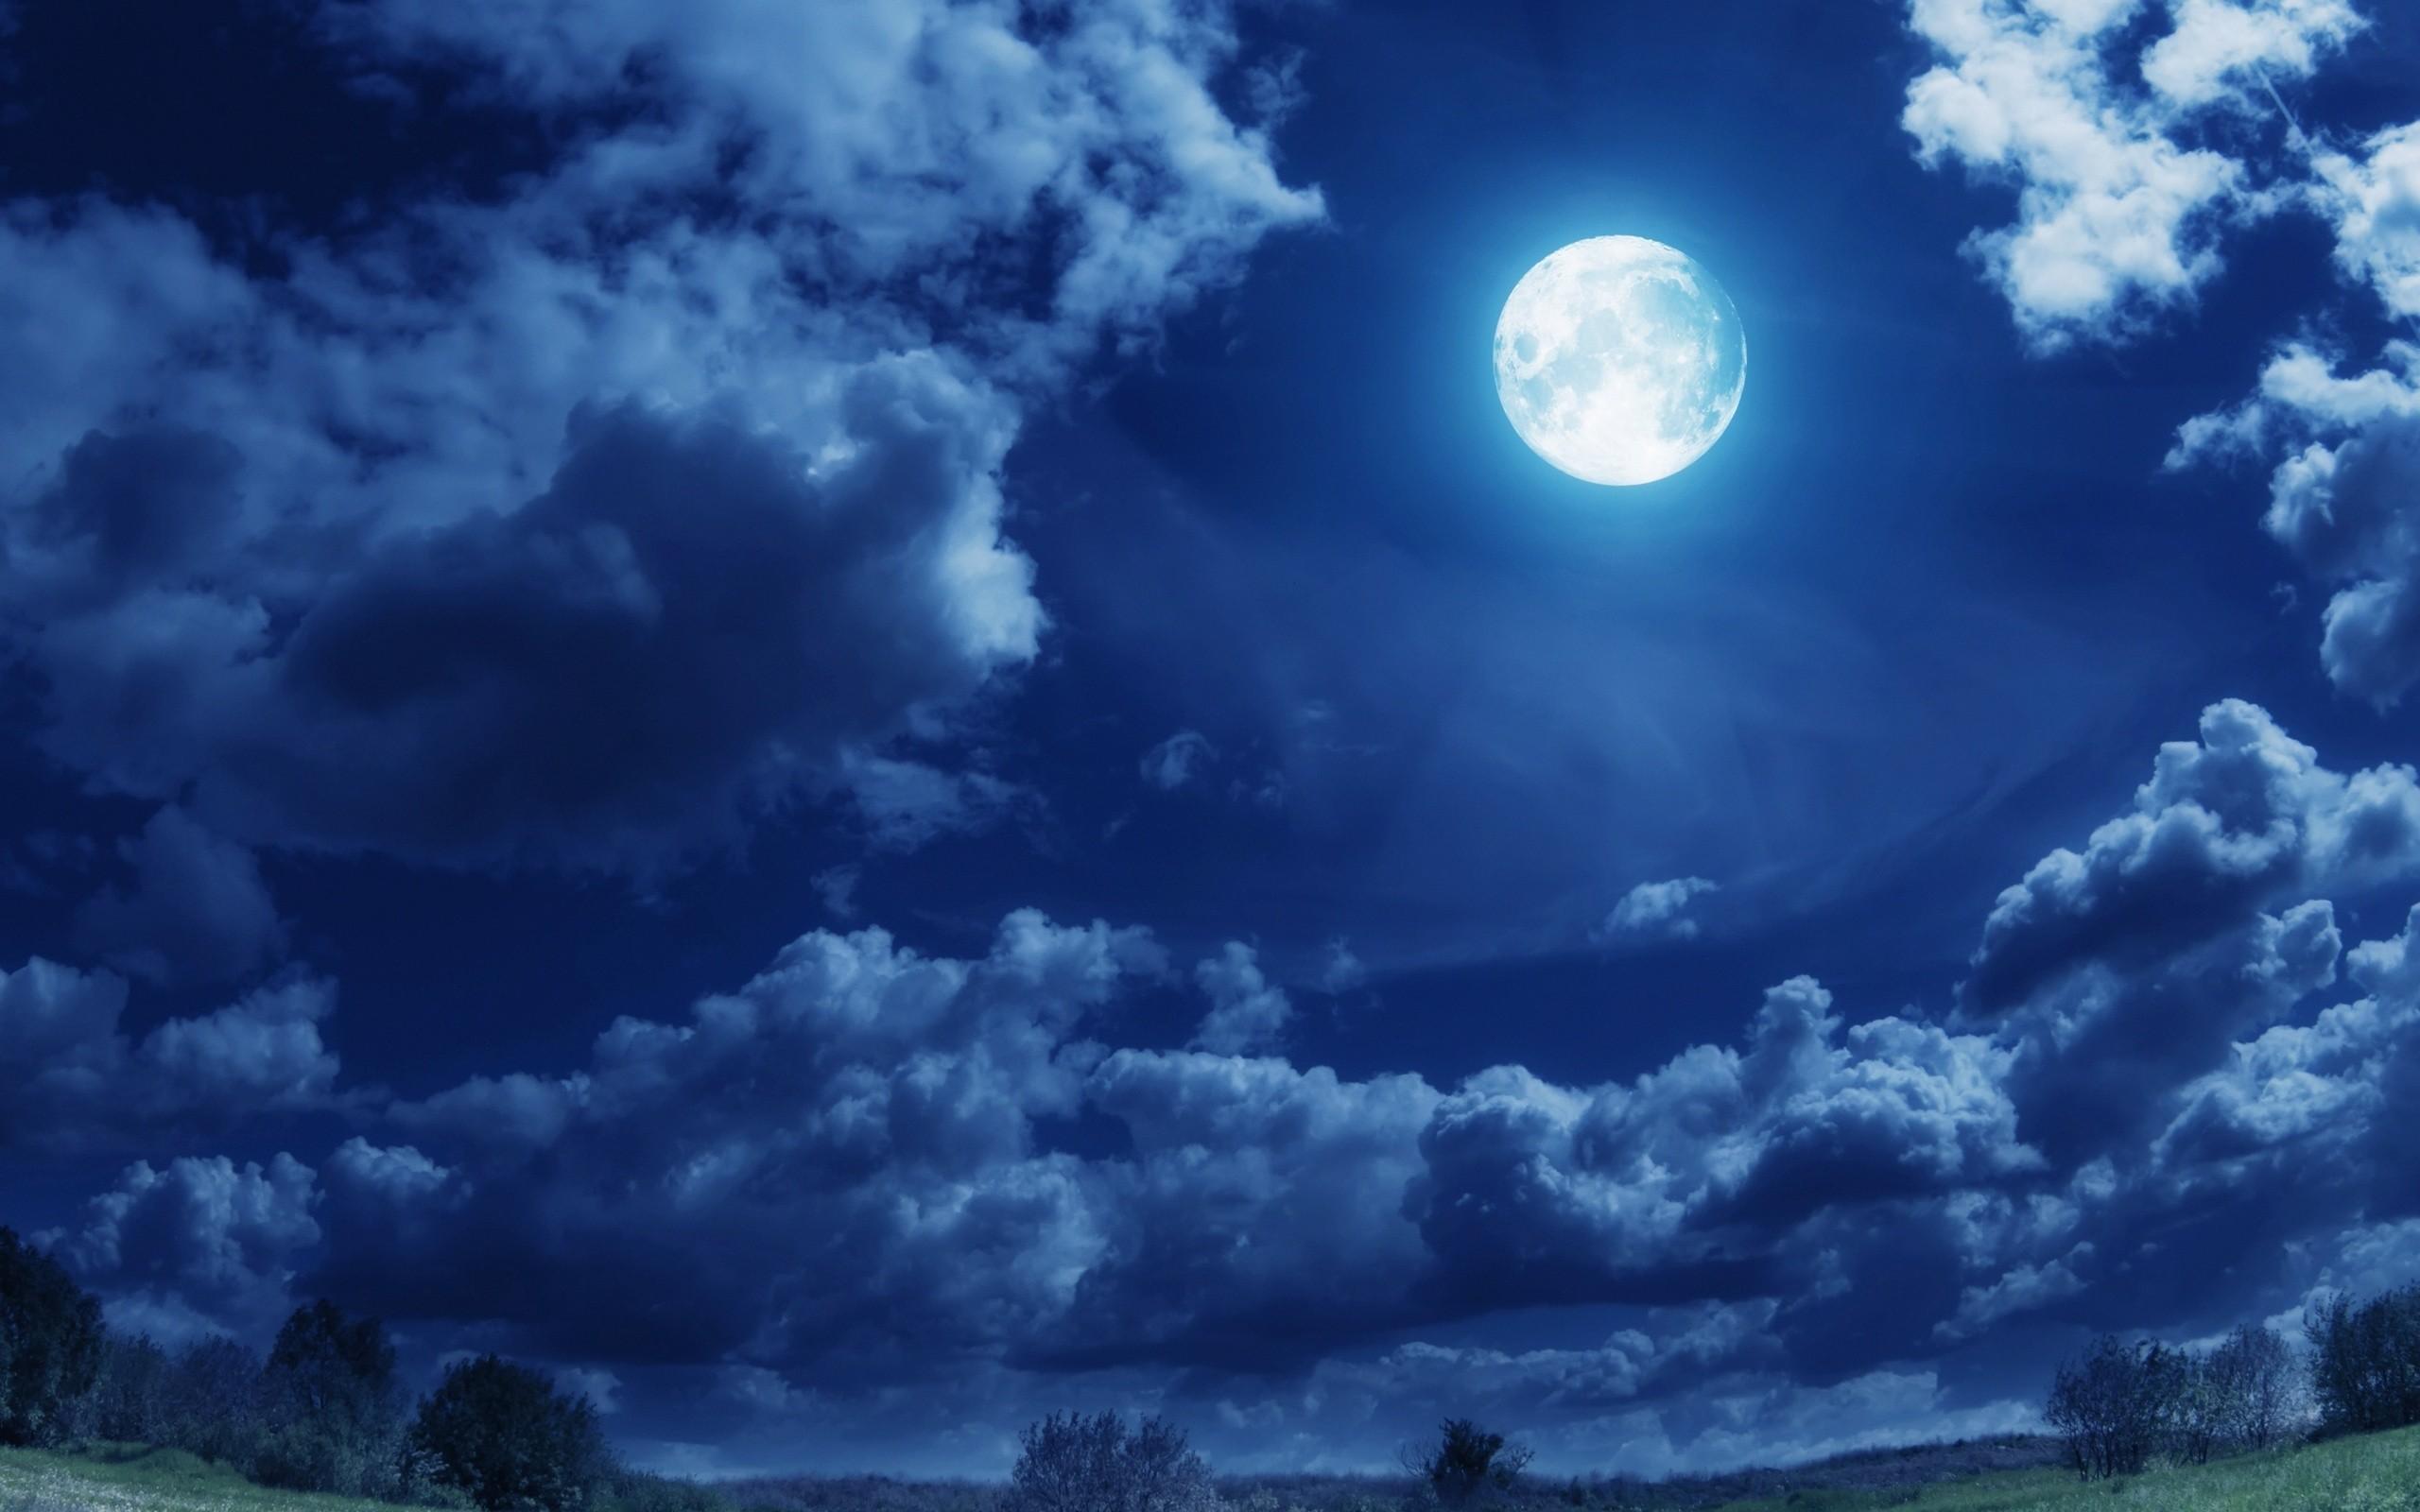 Wallpaper night, sky, full moon, clouds, moon desktop wallpaper .